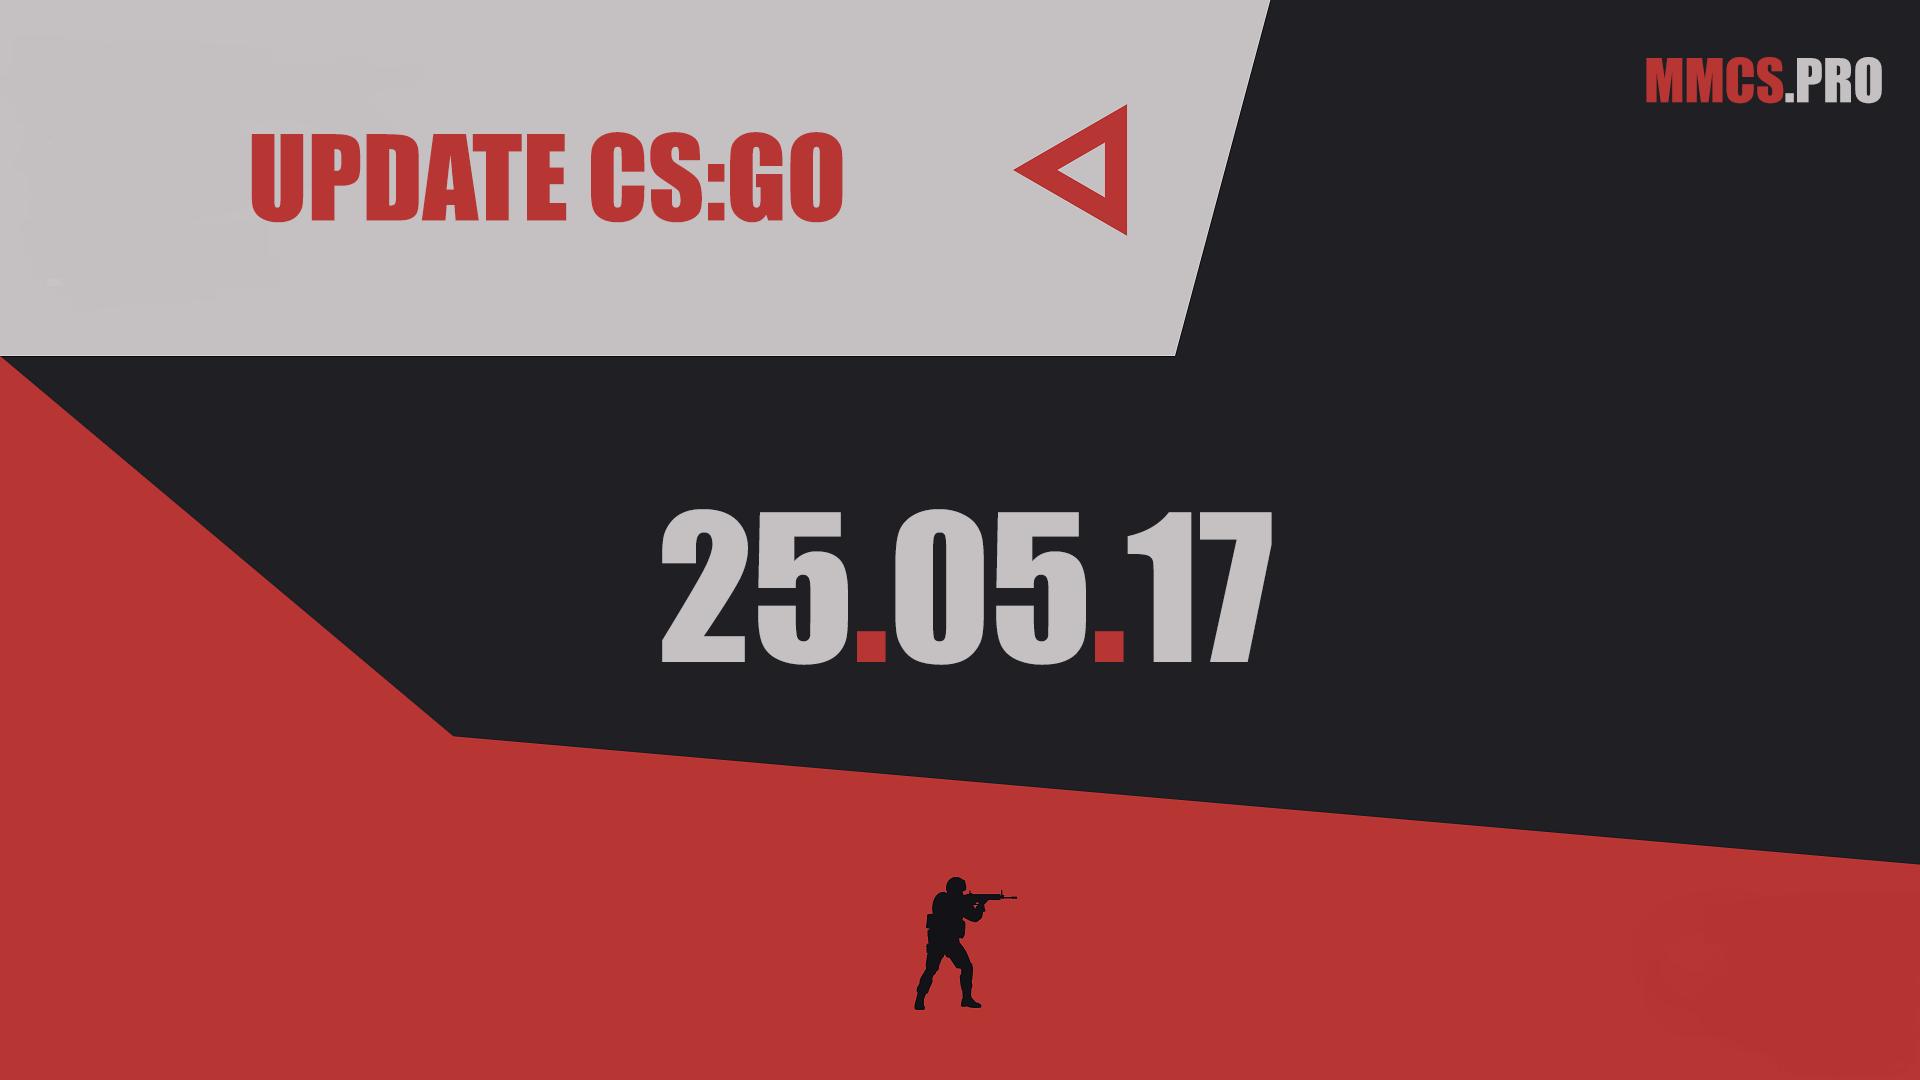 https://mmcs.pro/update-csgo-25-05-2017-valve/